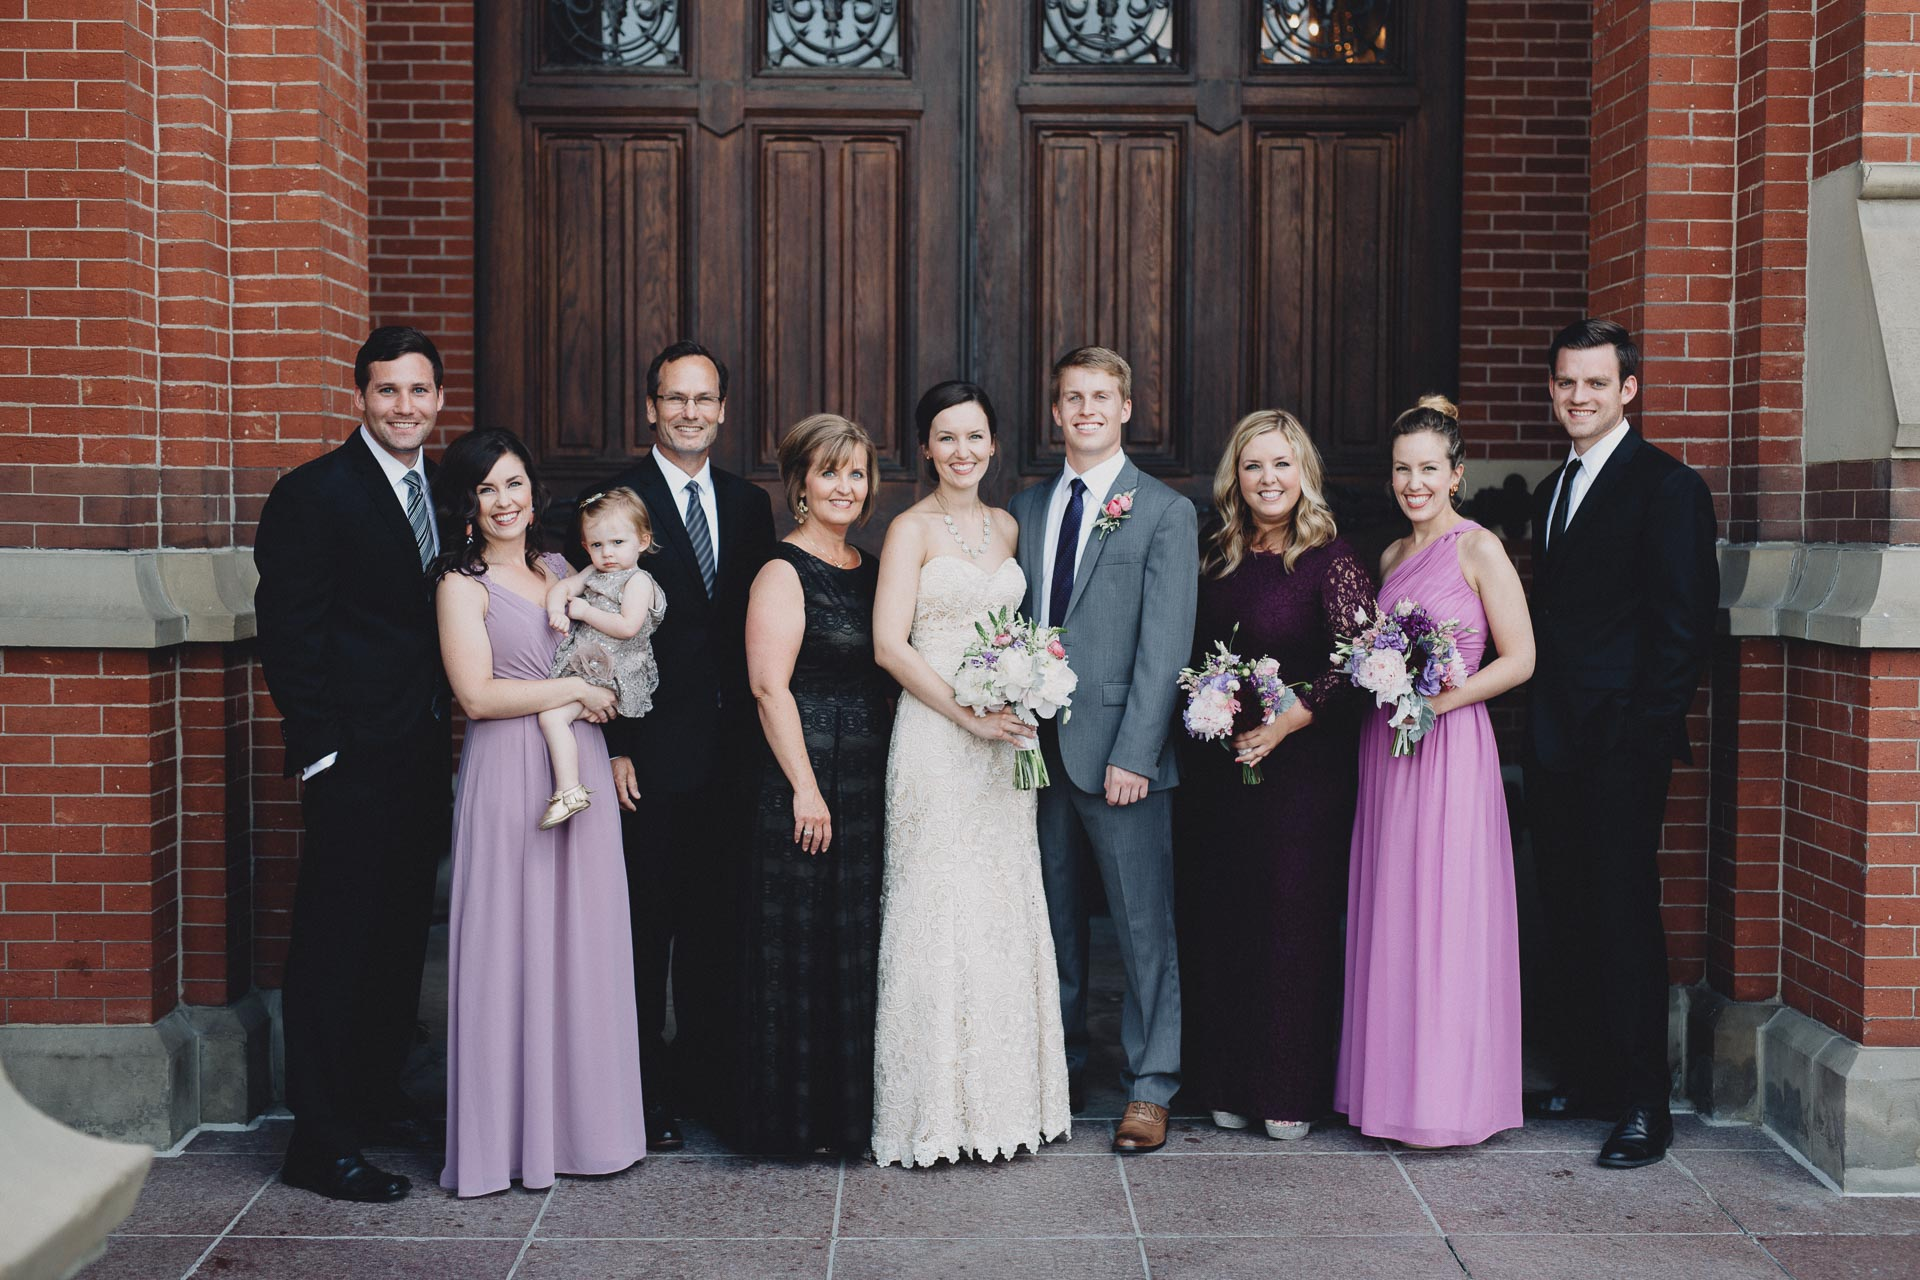 Julia-Michael-Cincinnati-Music-Hall-Wedding-084@2x.jpg